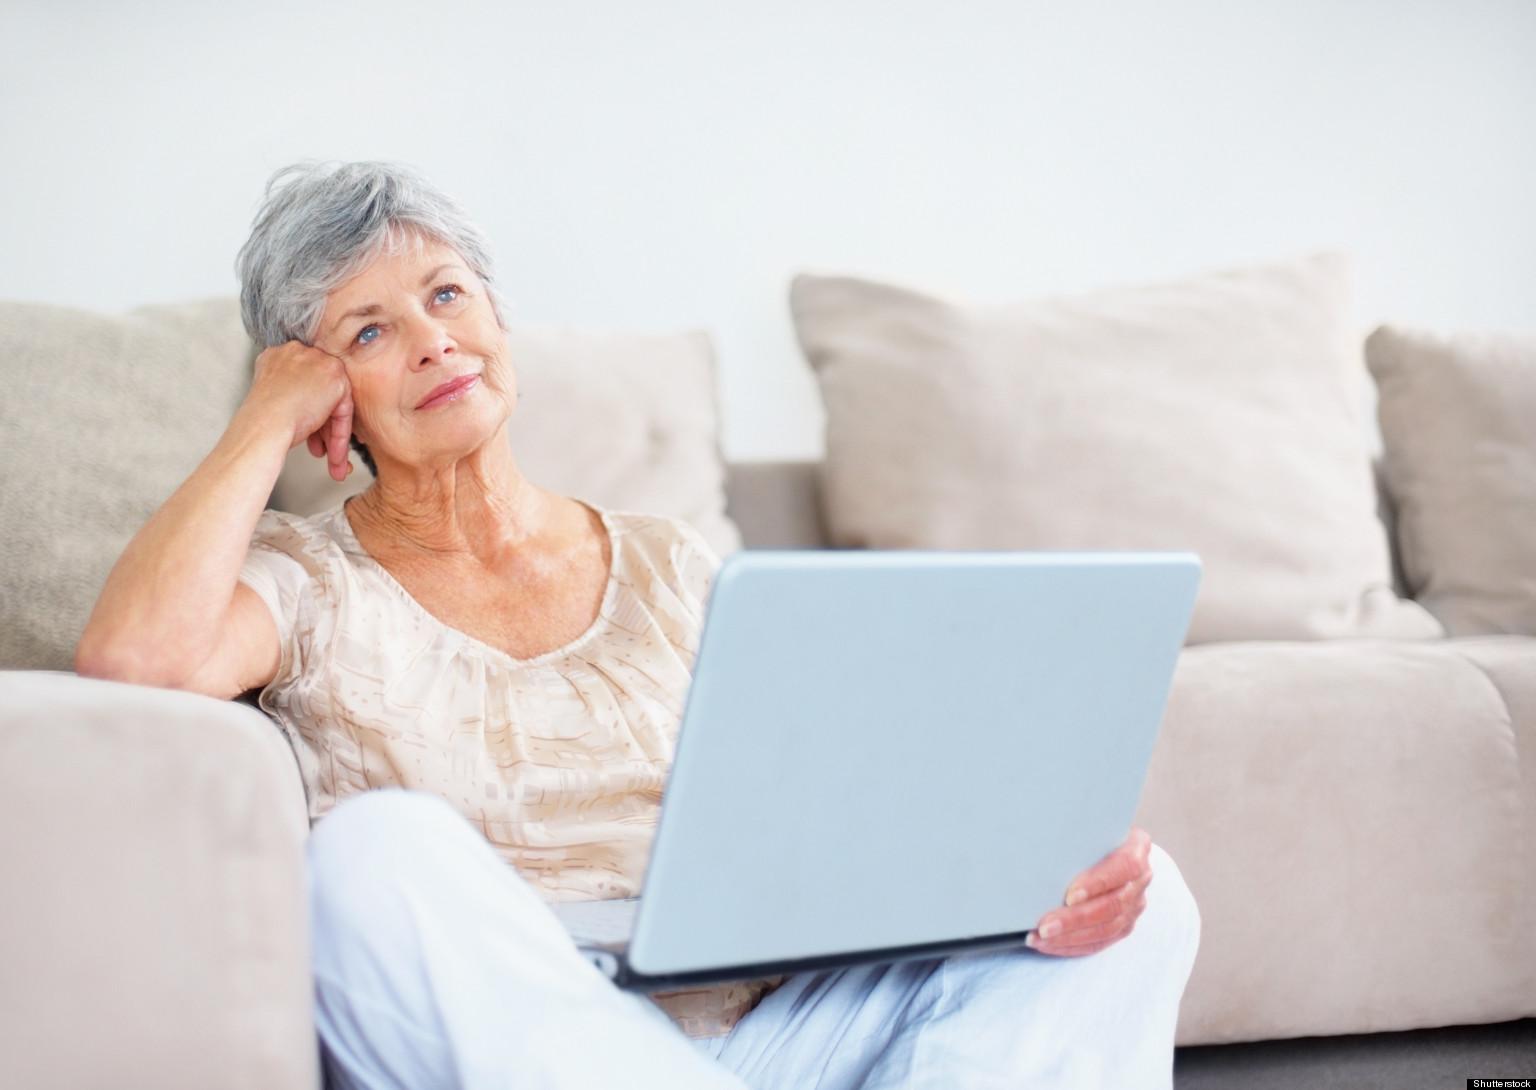 Online dating through facebook in Perth